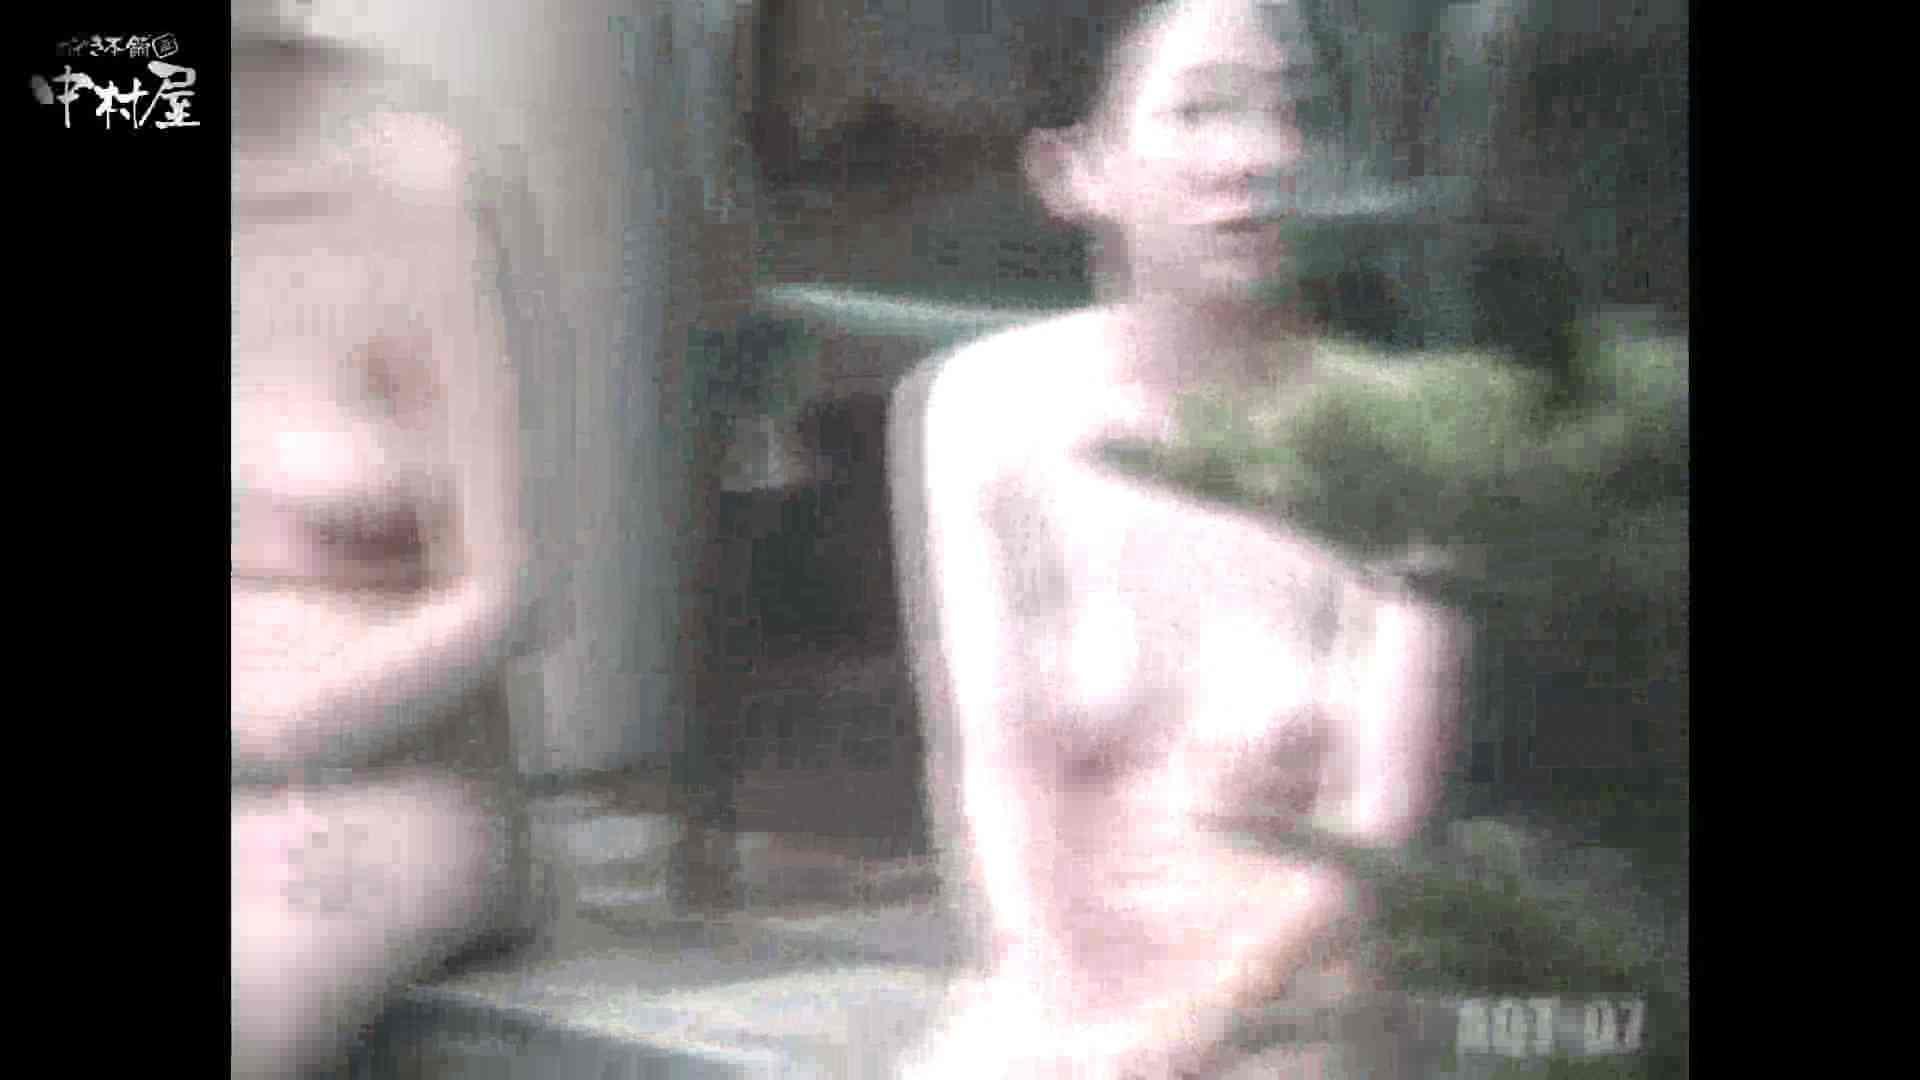 Aquaな露天風呂Vol.871潜入盗撮露天風呂七判湯 其の三 OLエロ画像  70PICs 56